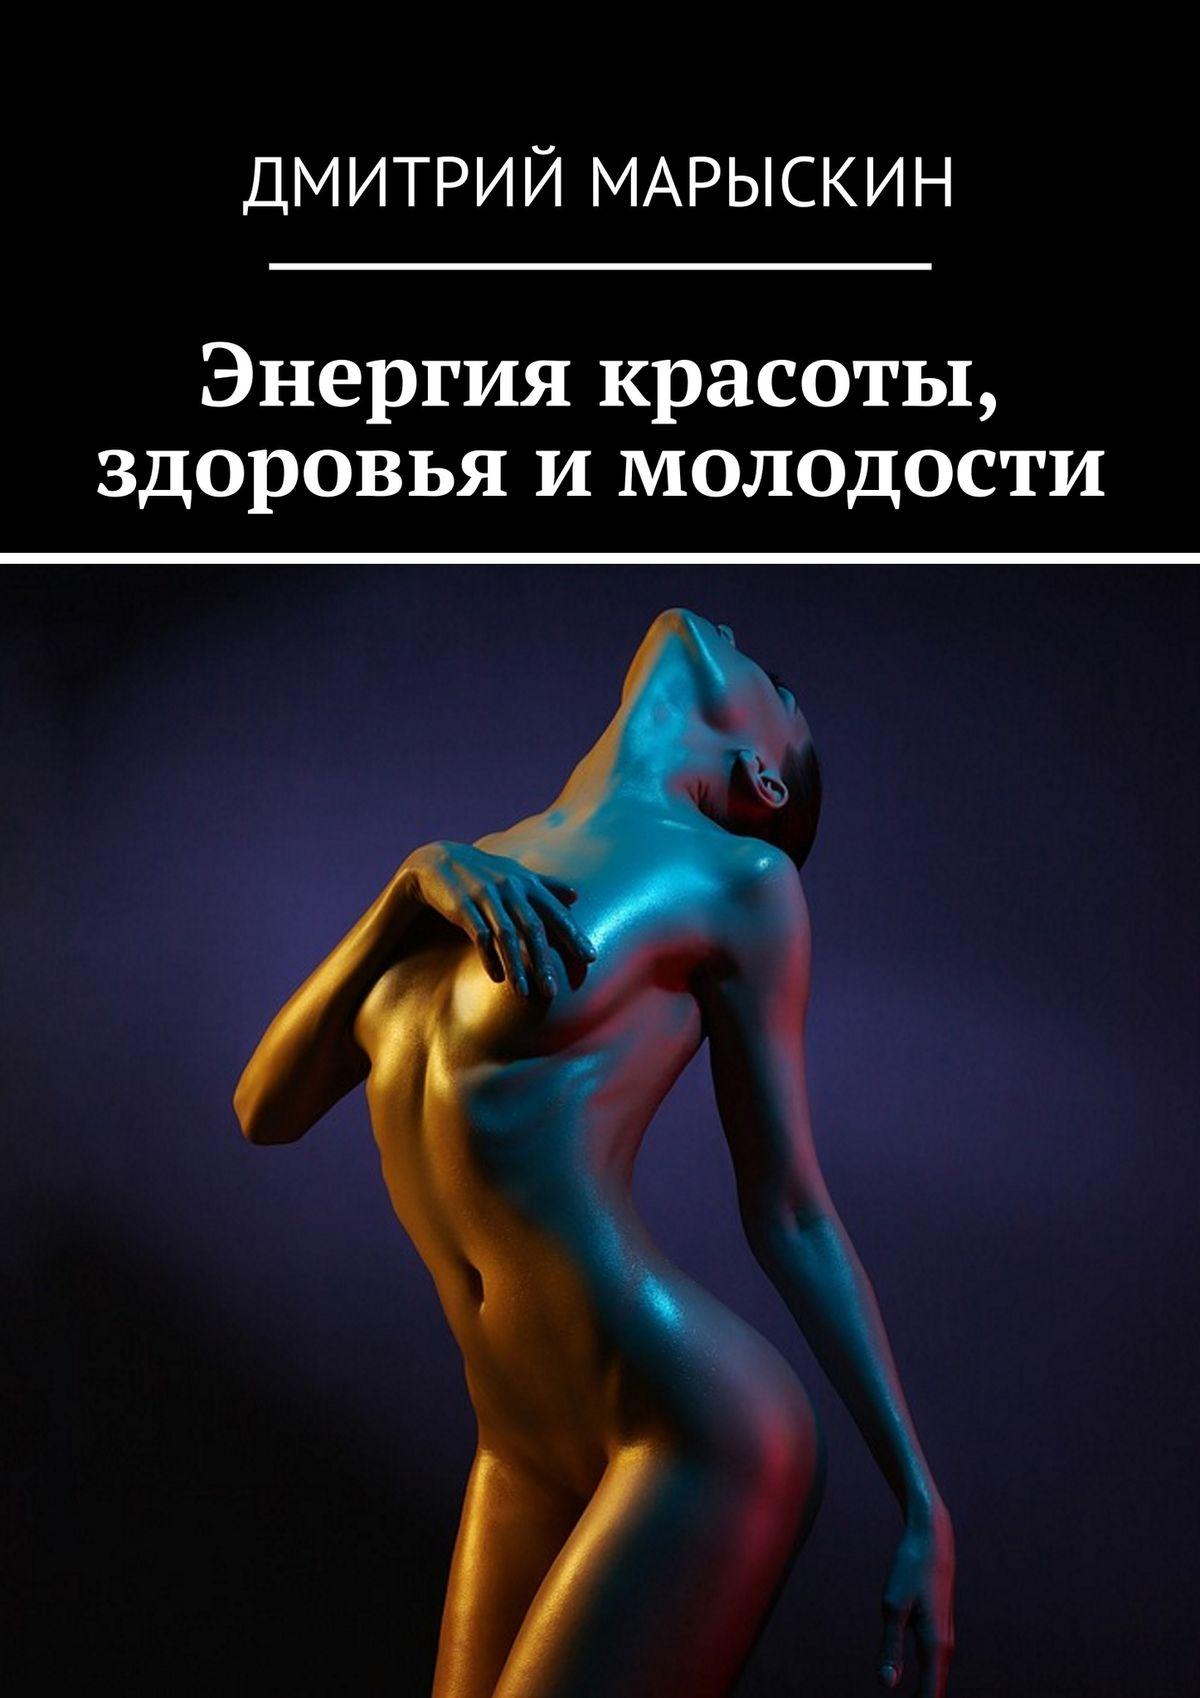 Дмитрий Марыскин Энергия красоты, здоровья и молодости бады здоровье и красота флавит м